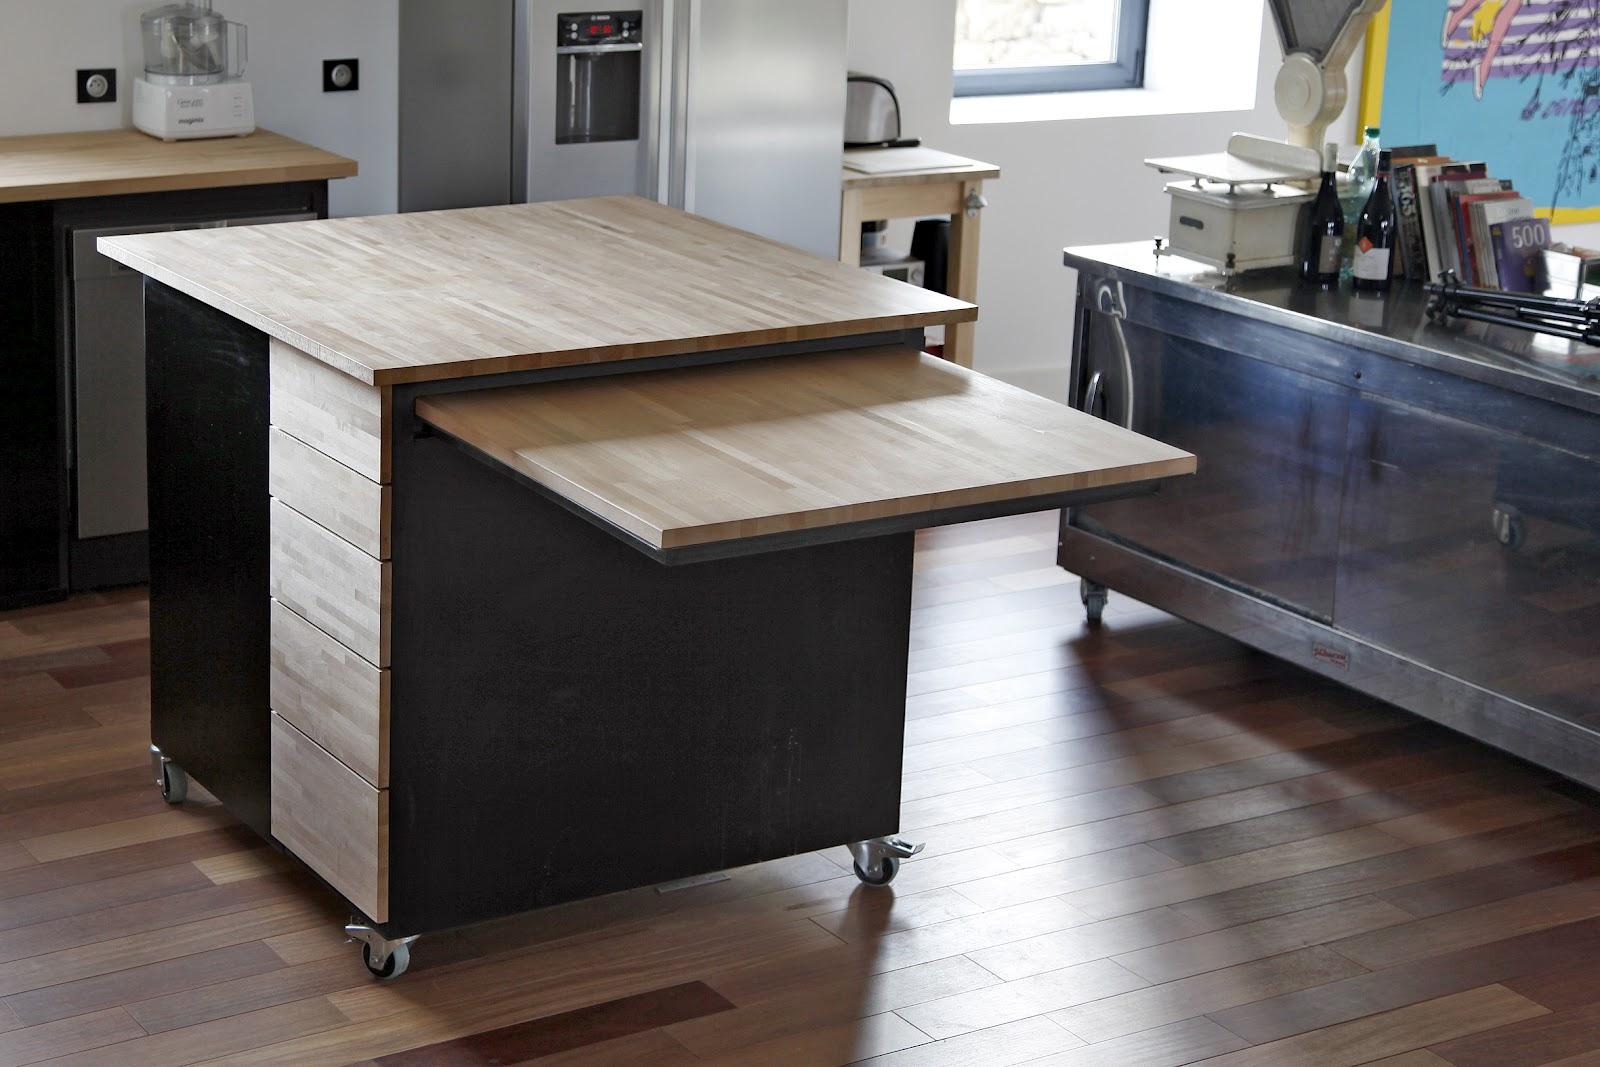 bertrand bajard cuisine desserte ilot. Black Bedroom Furniture Sets. Home Design Ideas